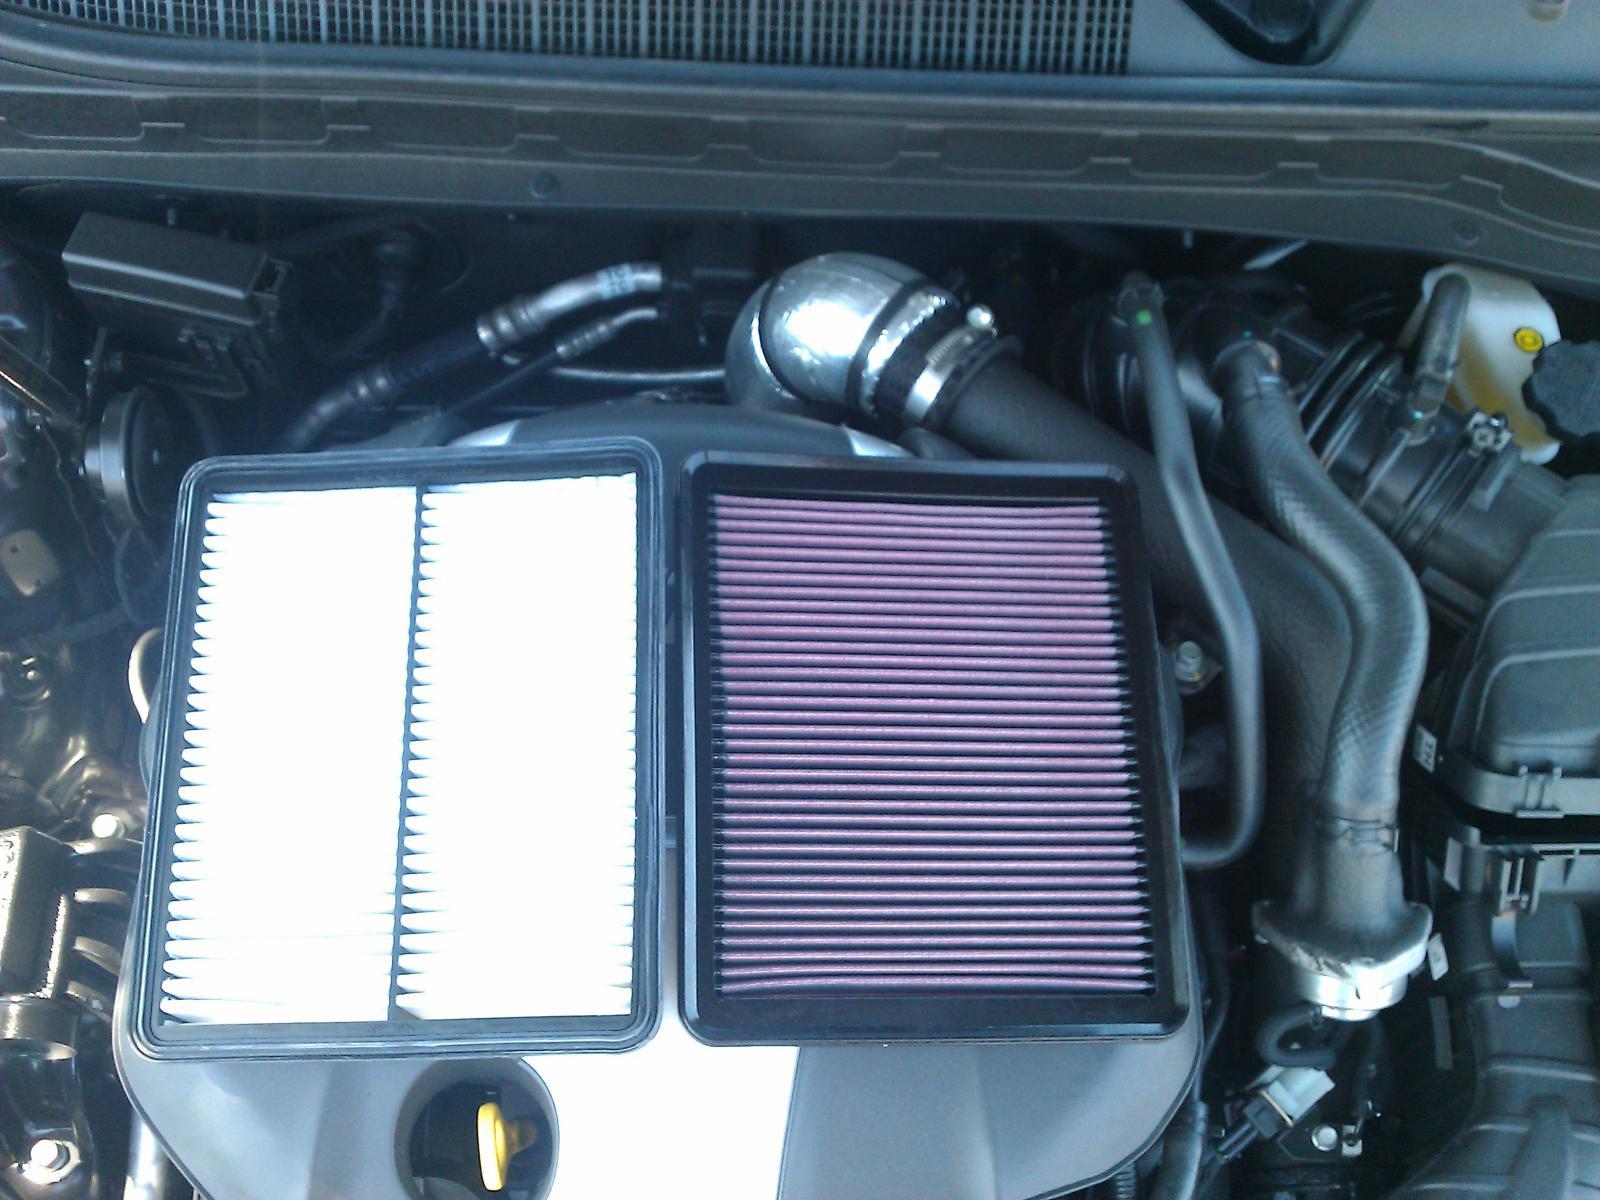 Toyota Tacoma 2015-2018 Service Manual: Front Radar Sensor Region Code Mismatch (C1A0A)